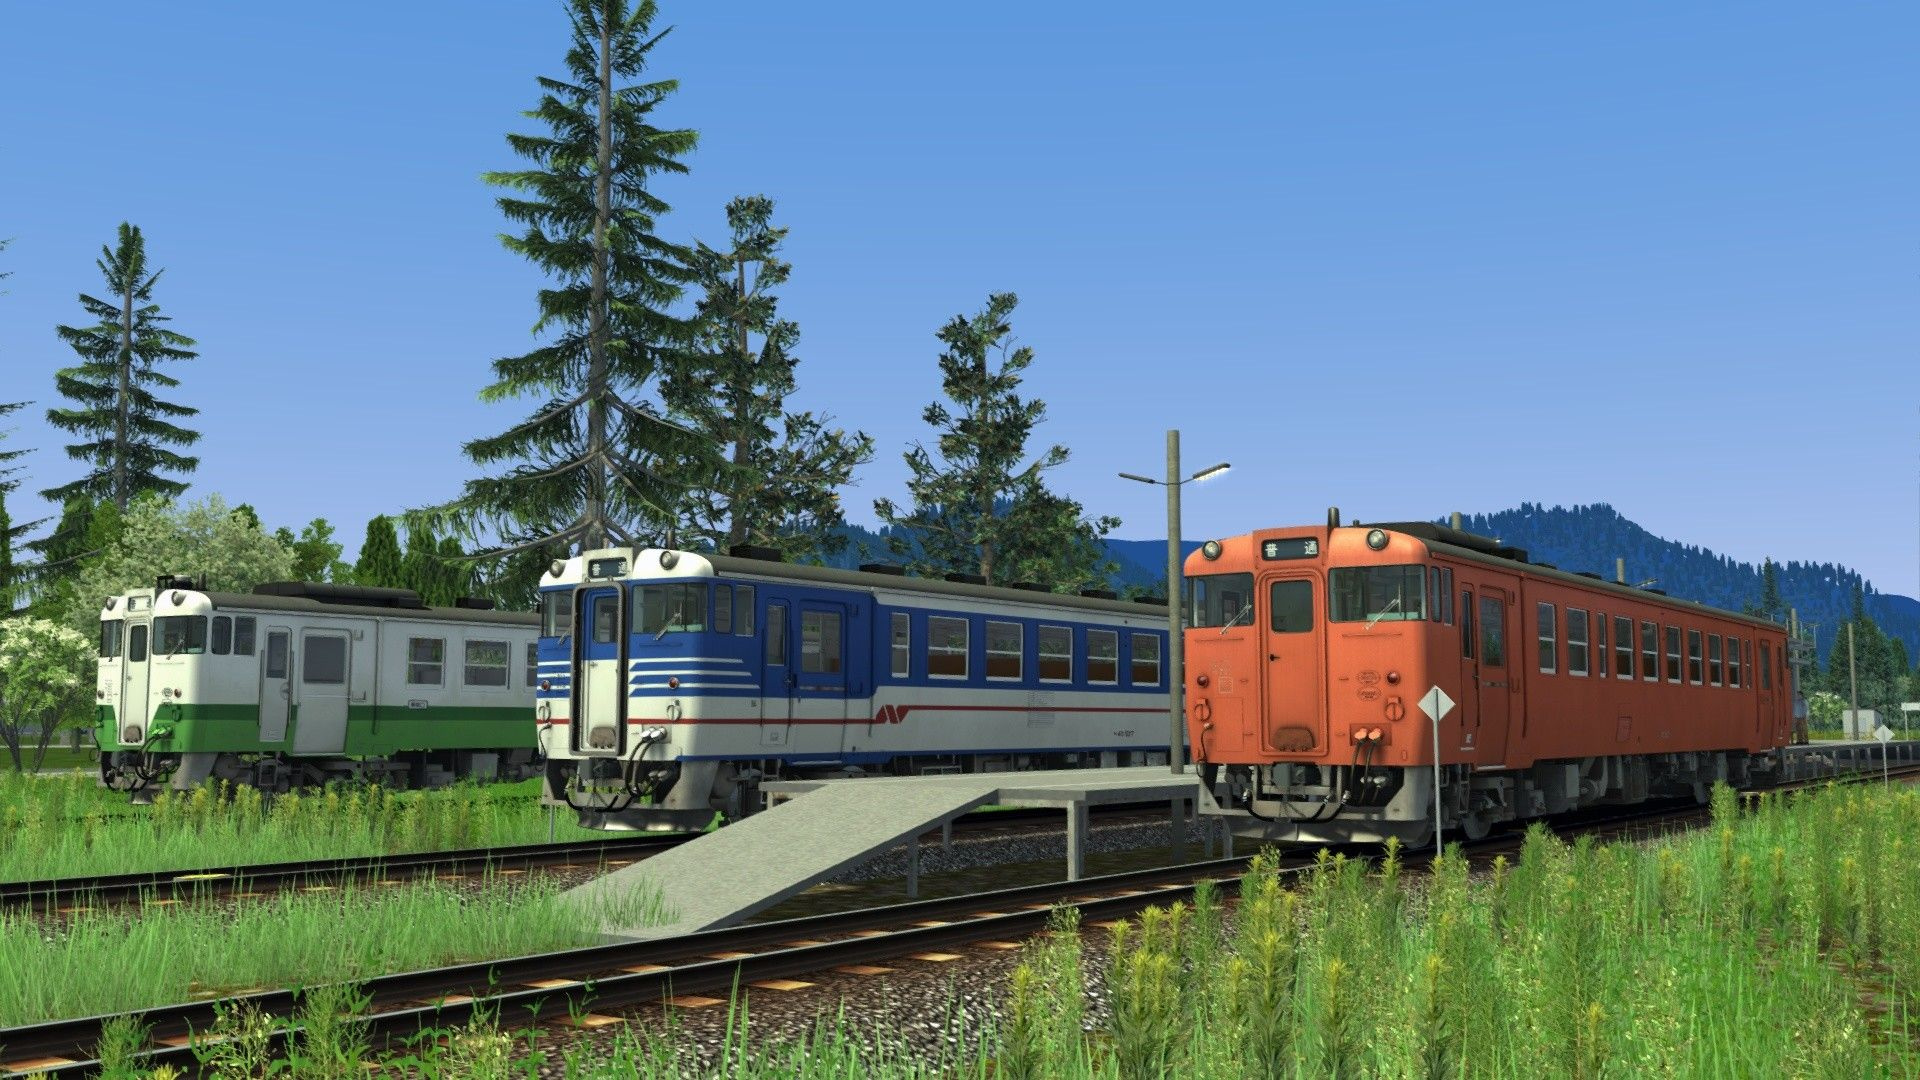 Train Simulator Tadami Line: Aizu-Wakamatsu to Tadami